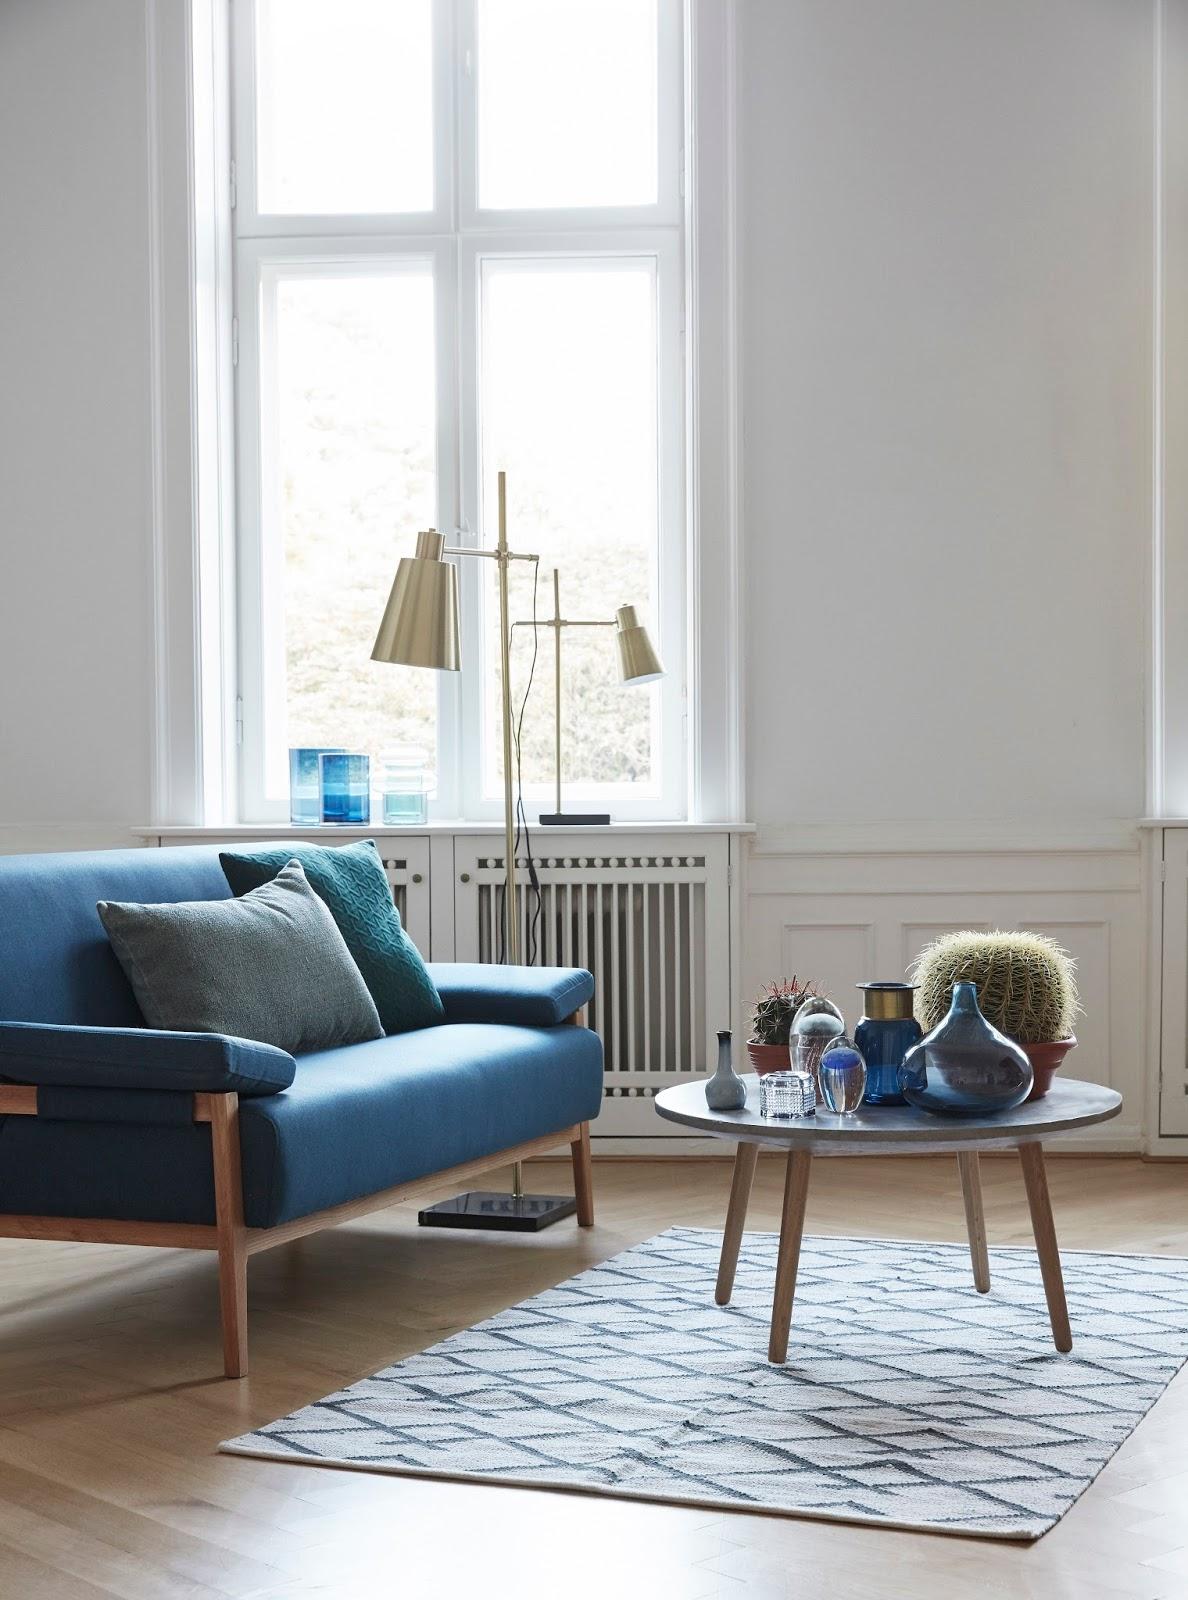 Hubsch sofa collection